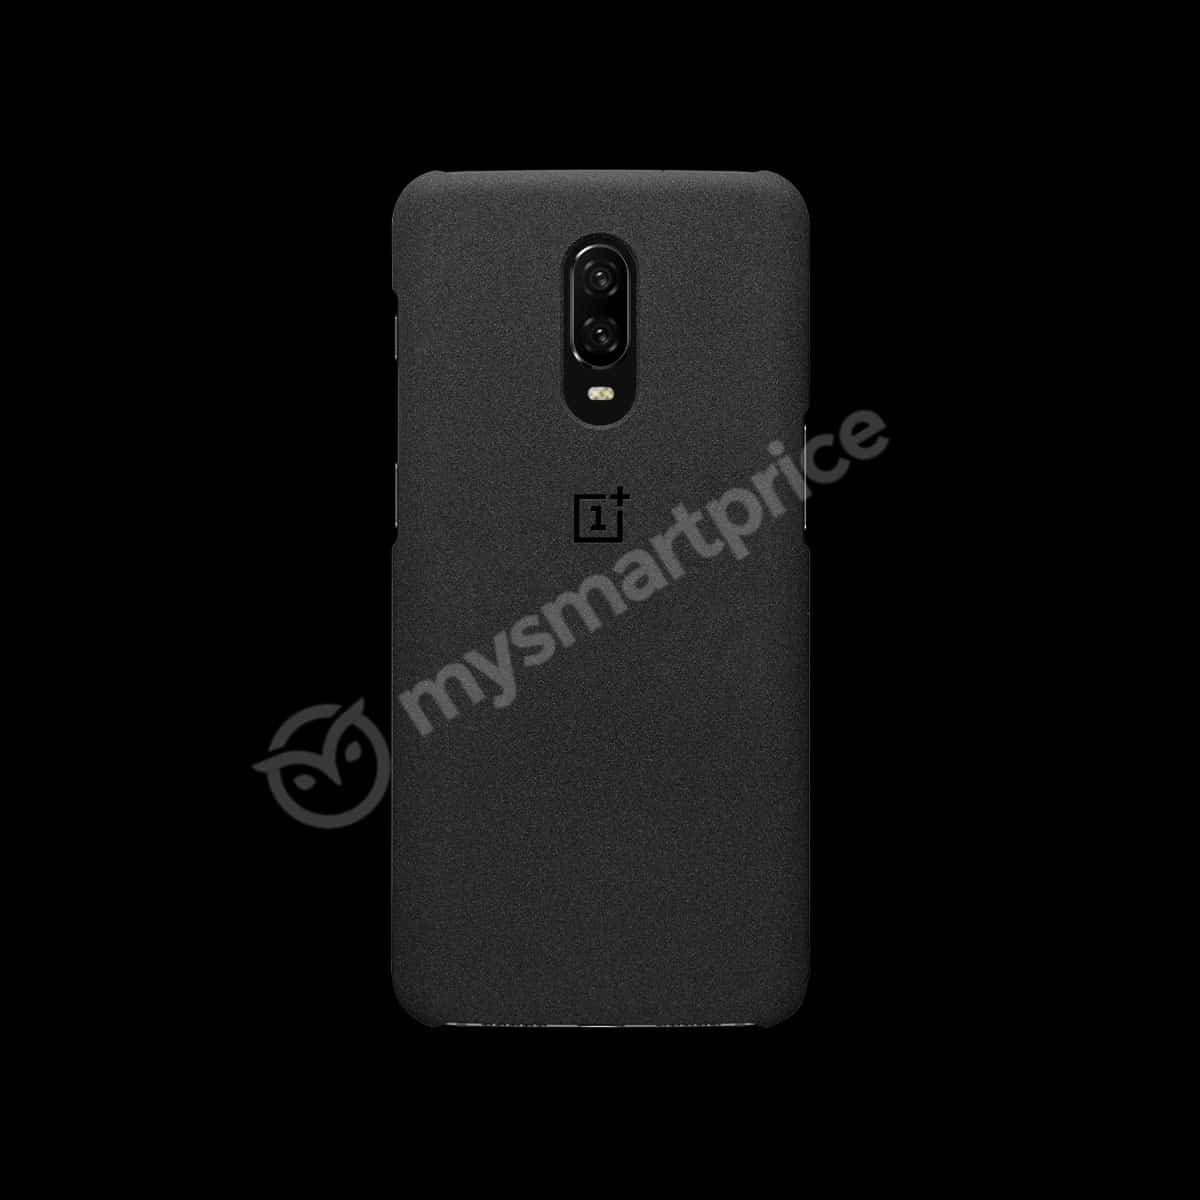 OnePlus 6T Protective Case Sandstone leak 1